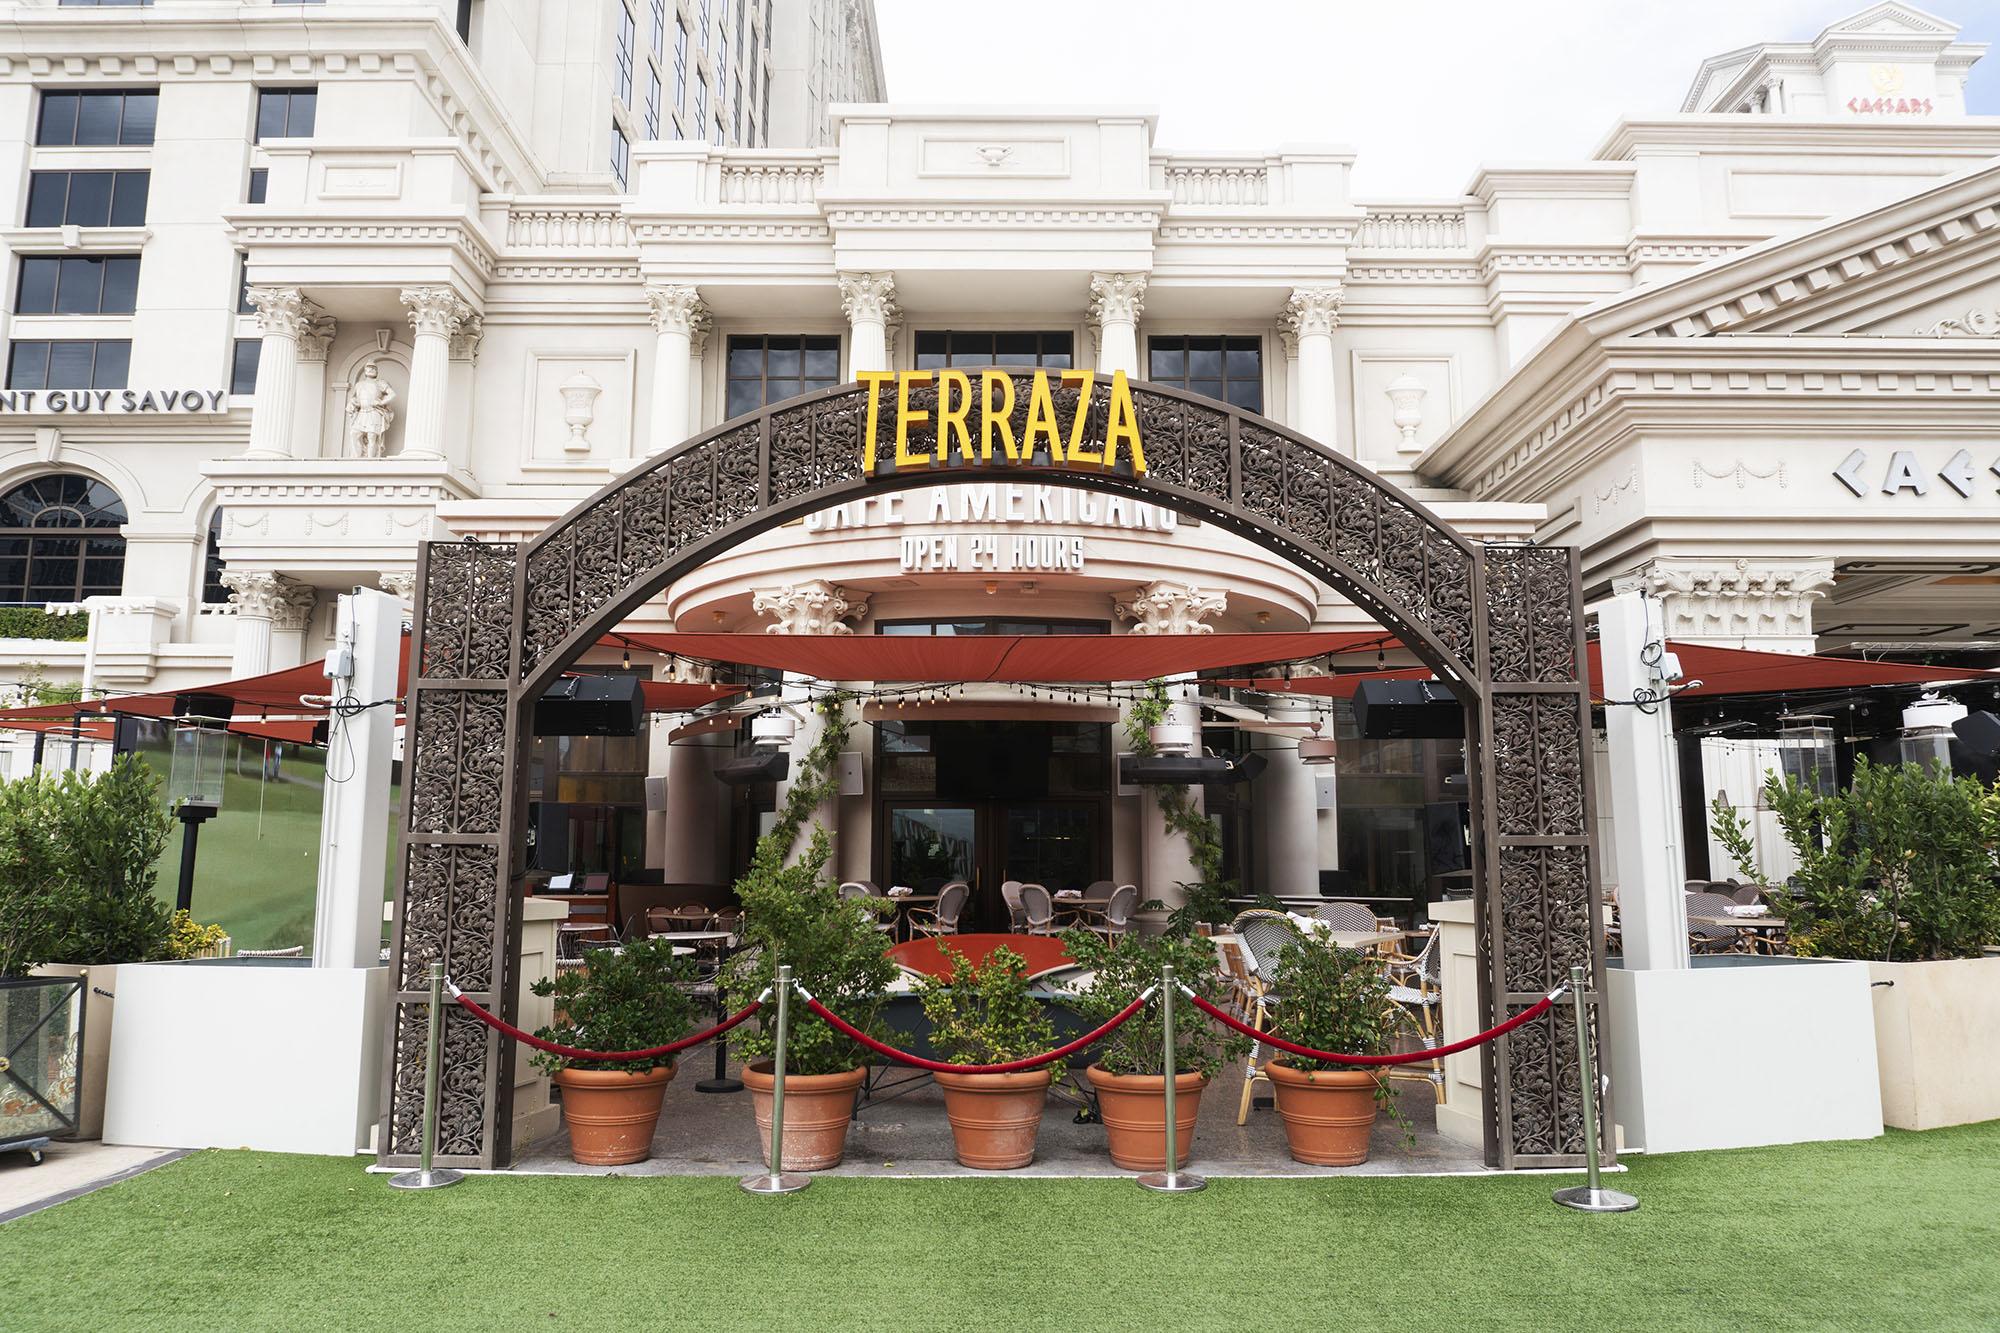 Terraza by Café Americano